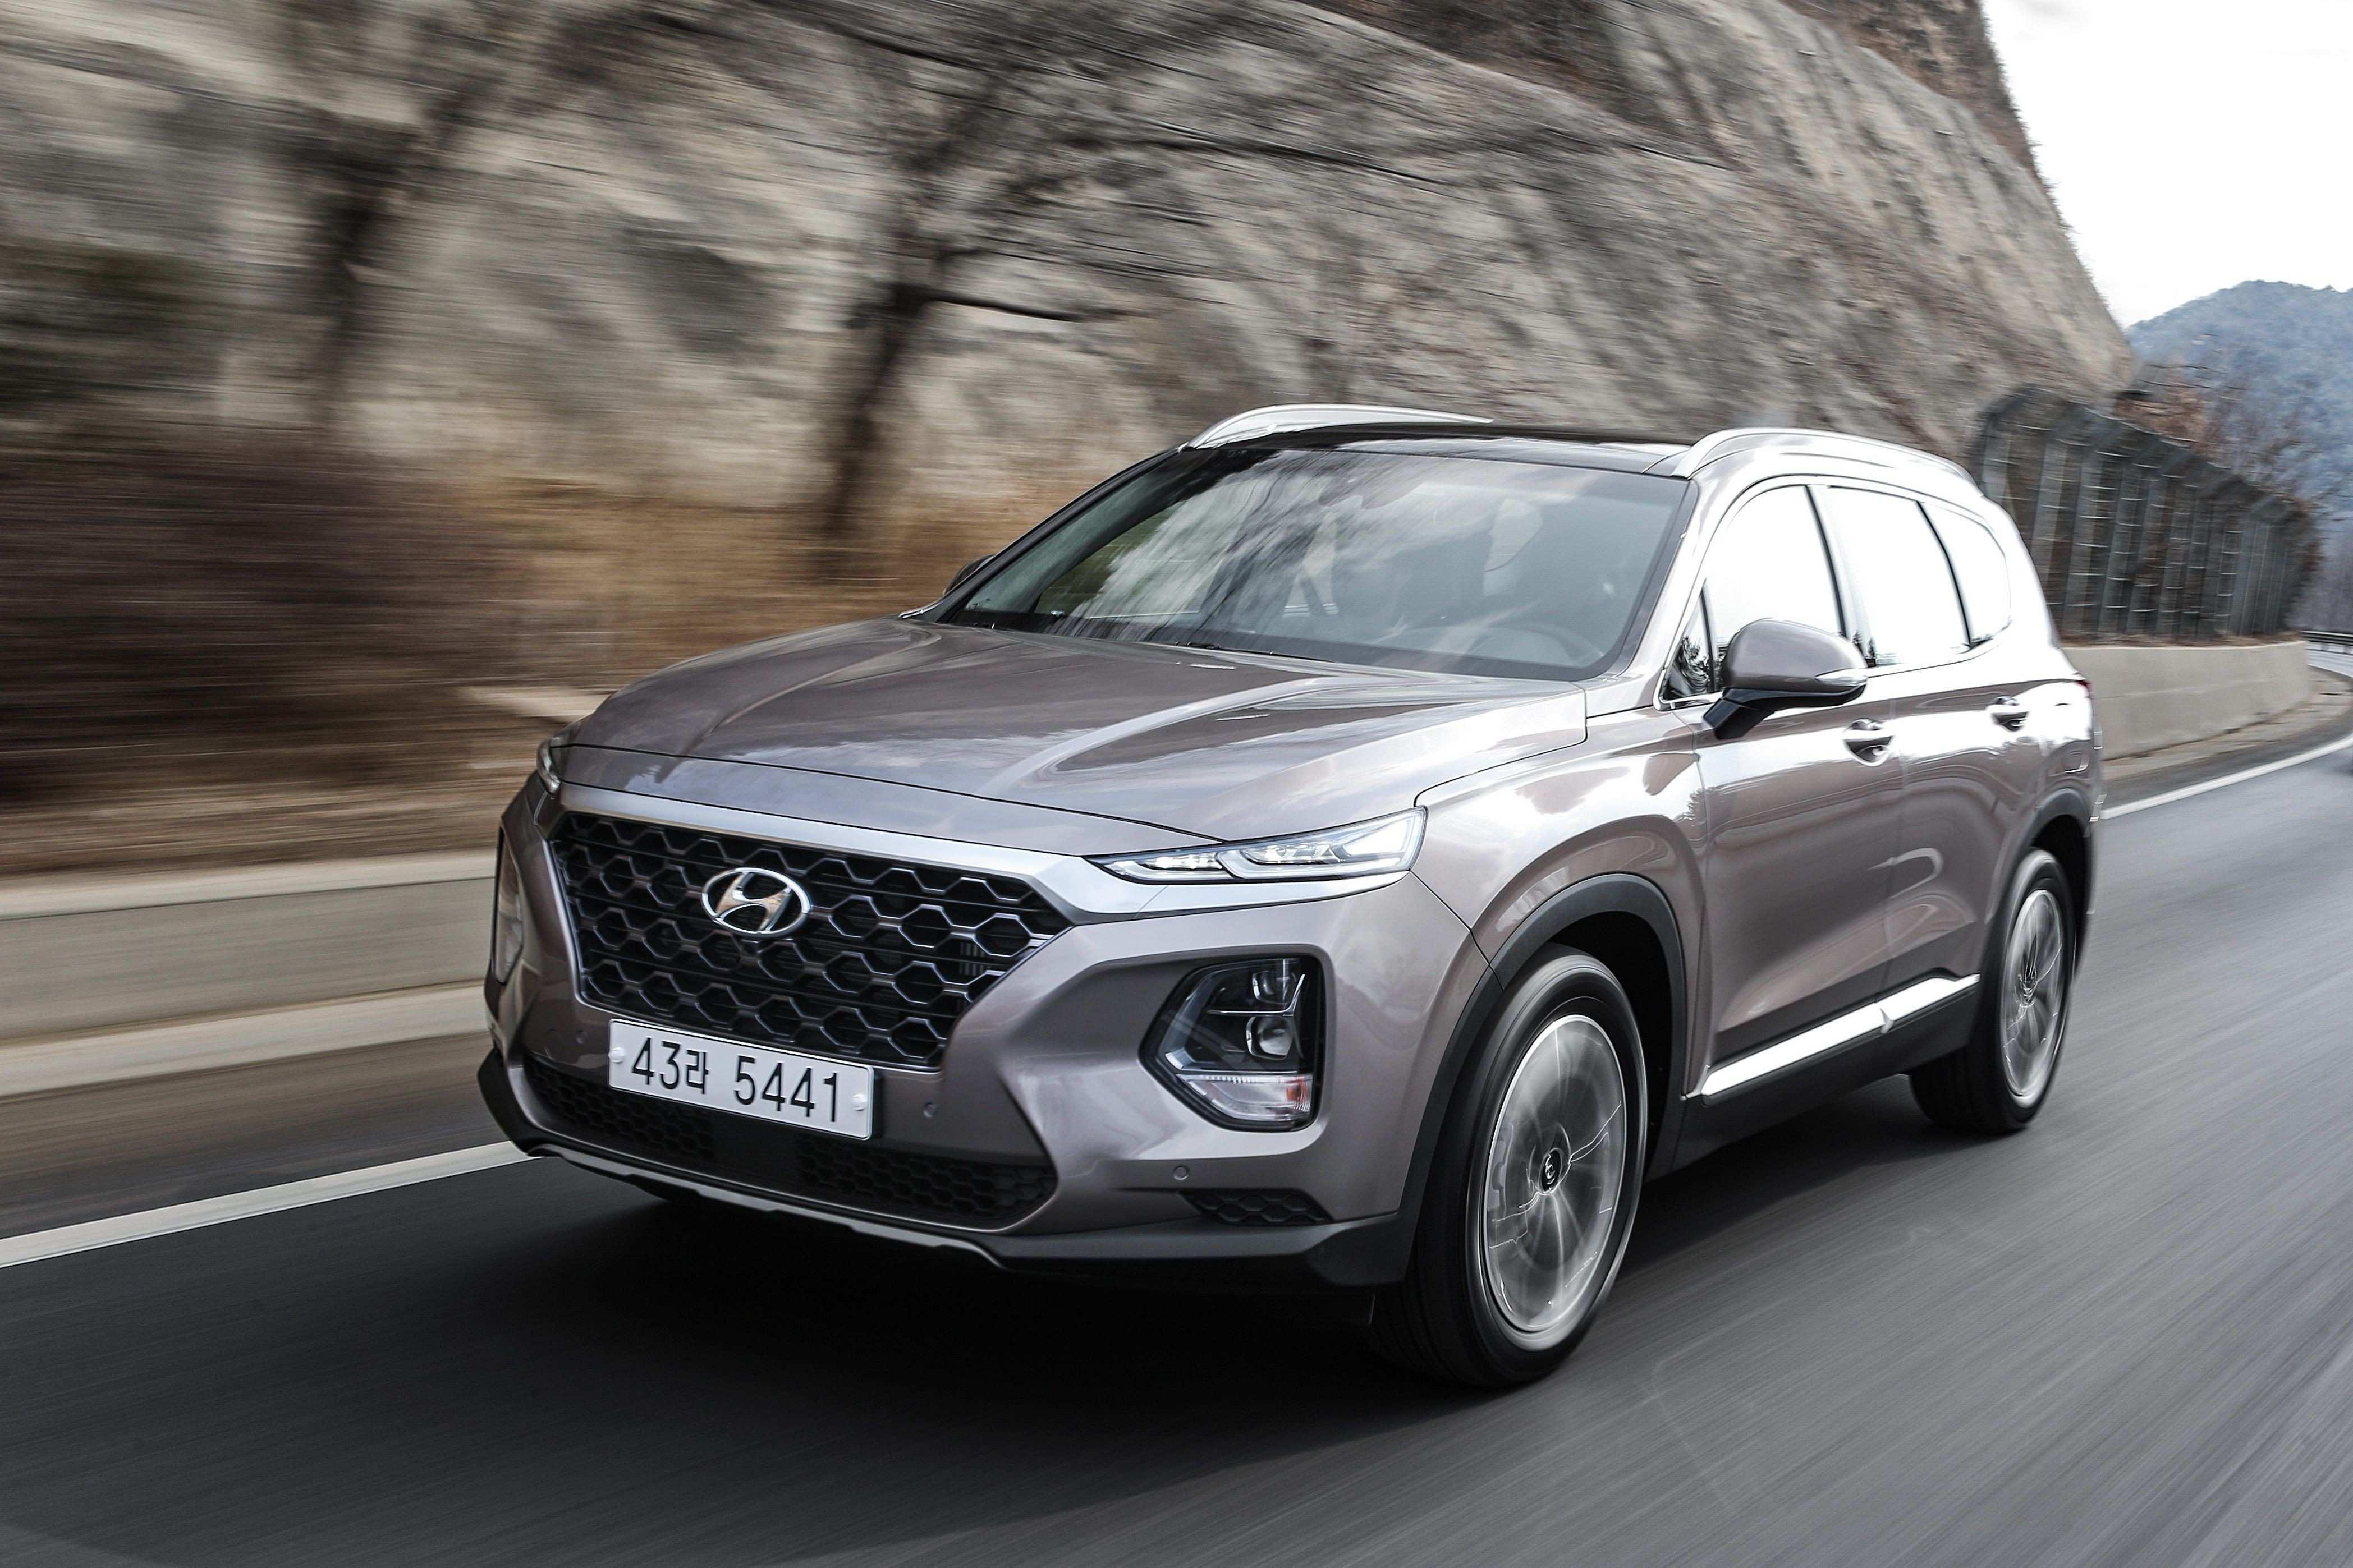 30 Concept of 2019 Hyundai Minivan History by 2019 Hyundai Minivan